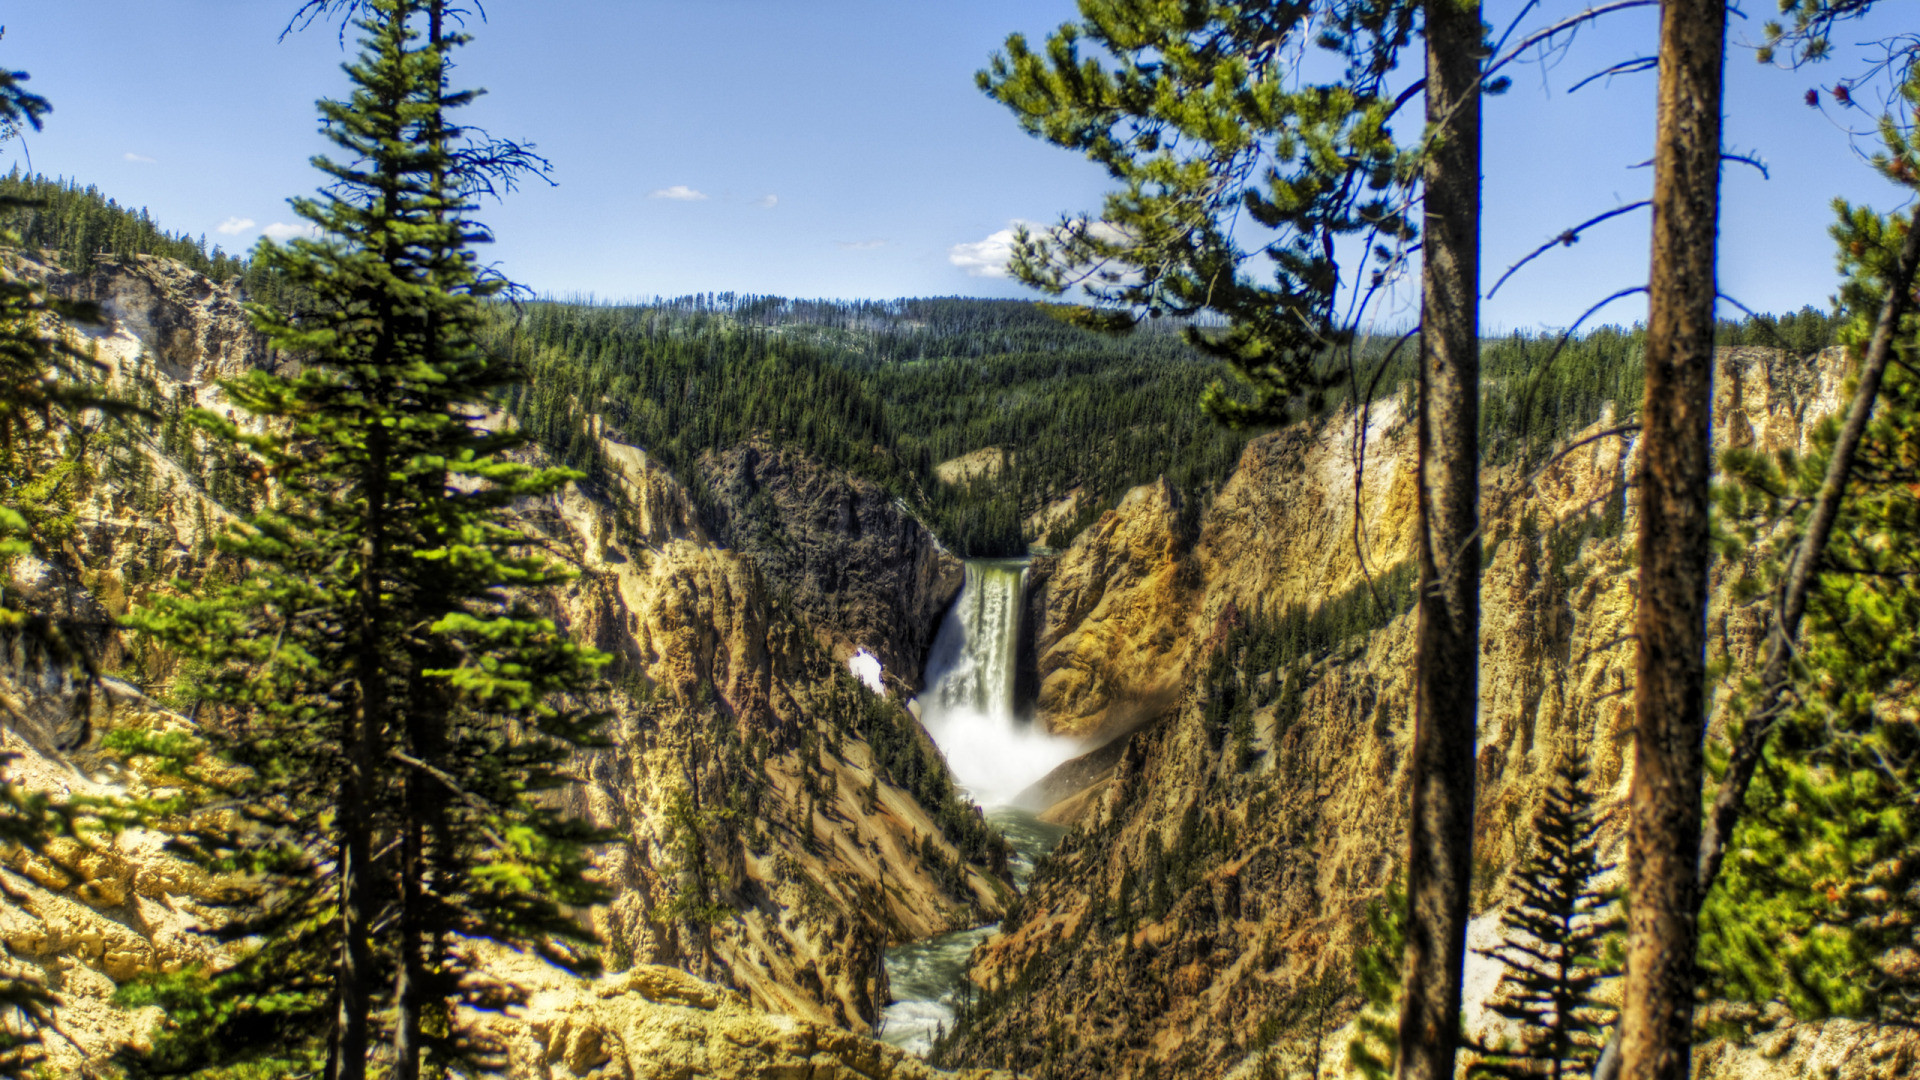 Falls Hd Wallpaper Free Download Yellowstone Wallpaper Widescreen 70 Images